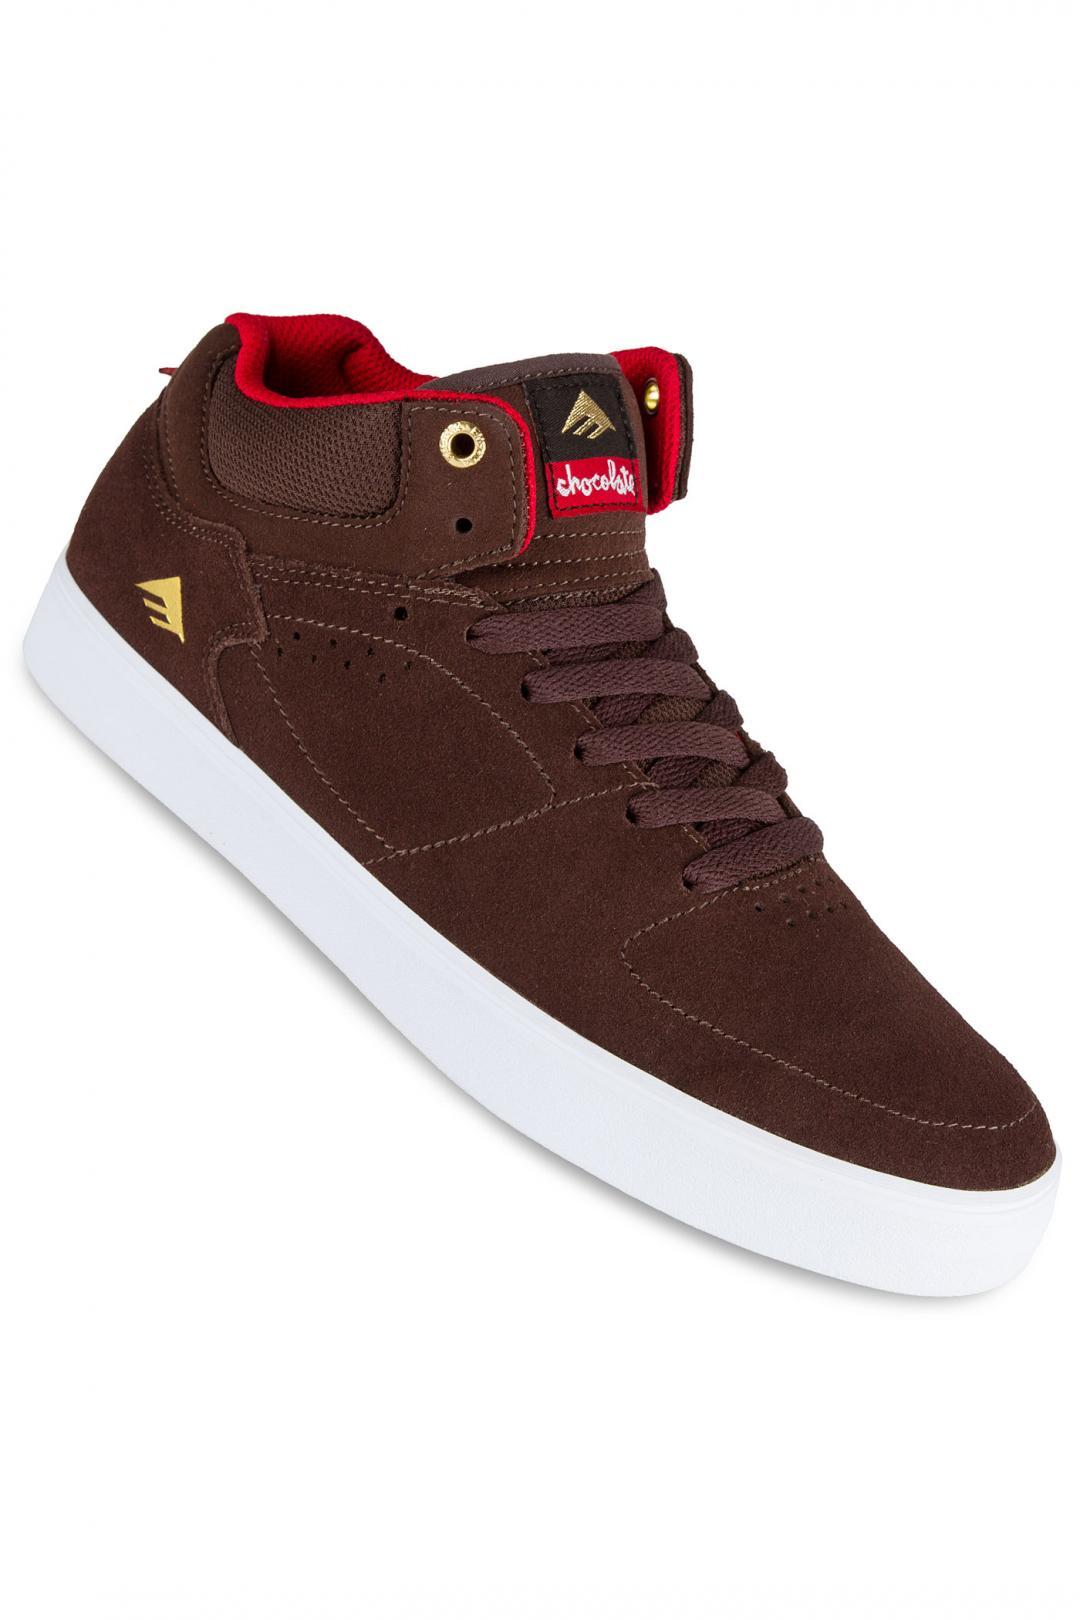 Uomo Emerica x Chocolate The HSU G6 brown white | Scarpe da skate